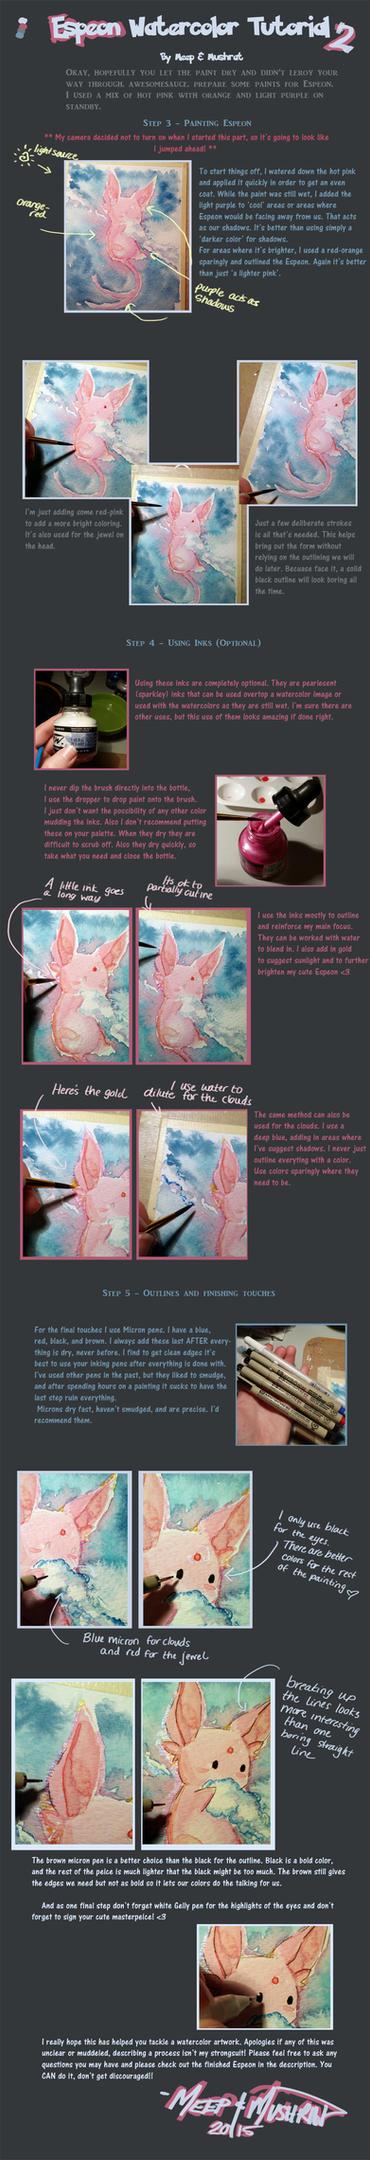 Watercolor Tutorial.Espeon Part 2 by L-Y-N-S